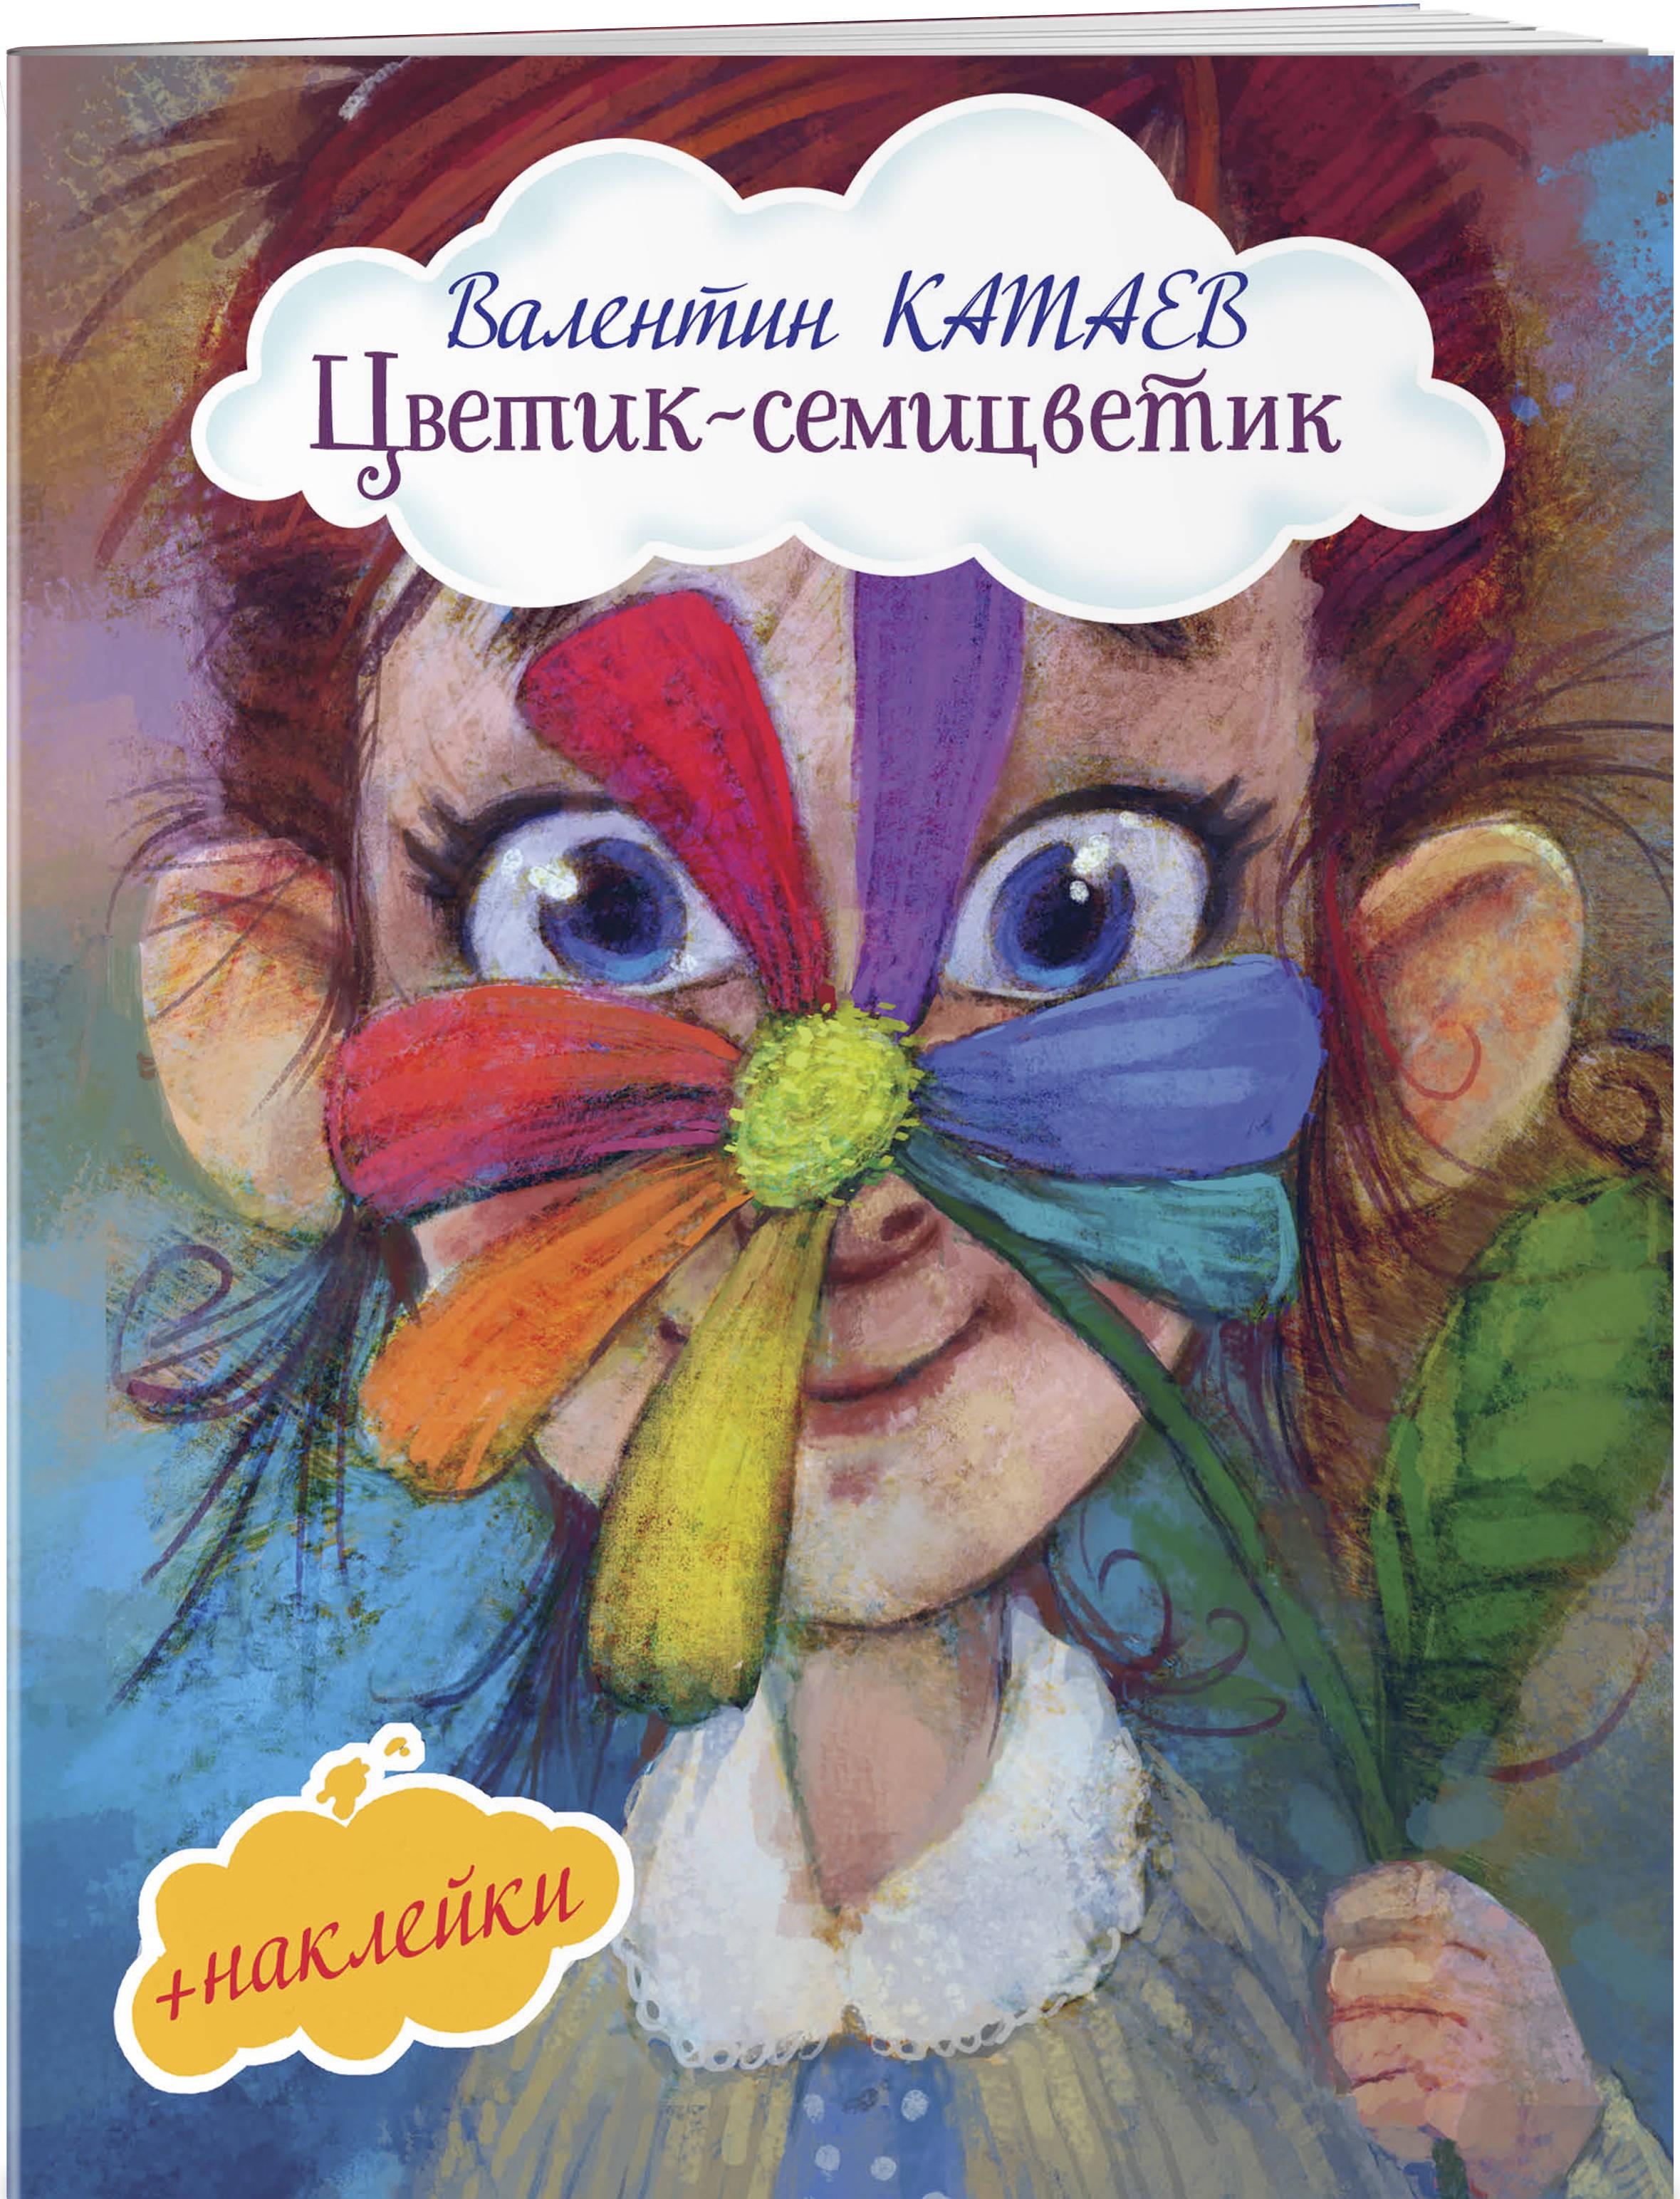 Валентин Катаев Цветик-семицветик валентин катаев жена